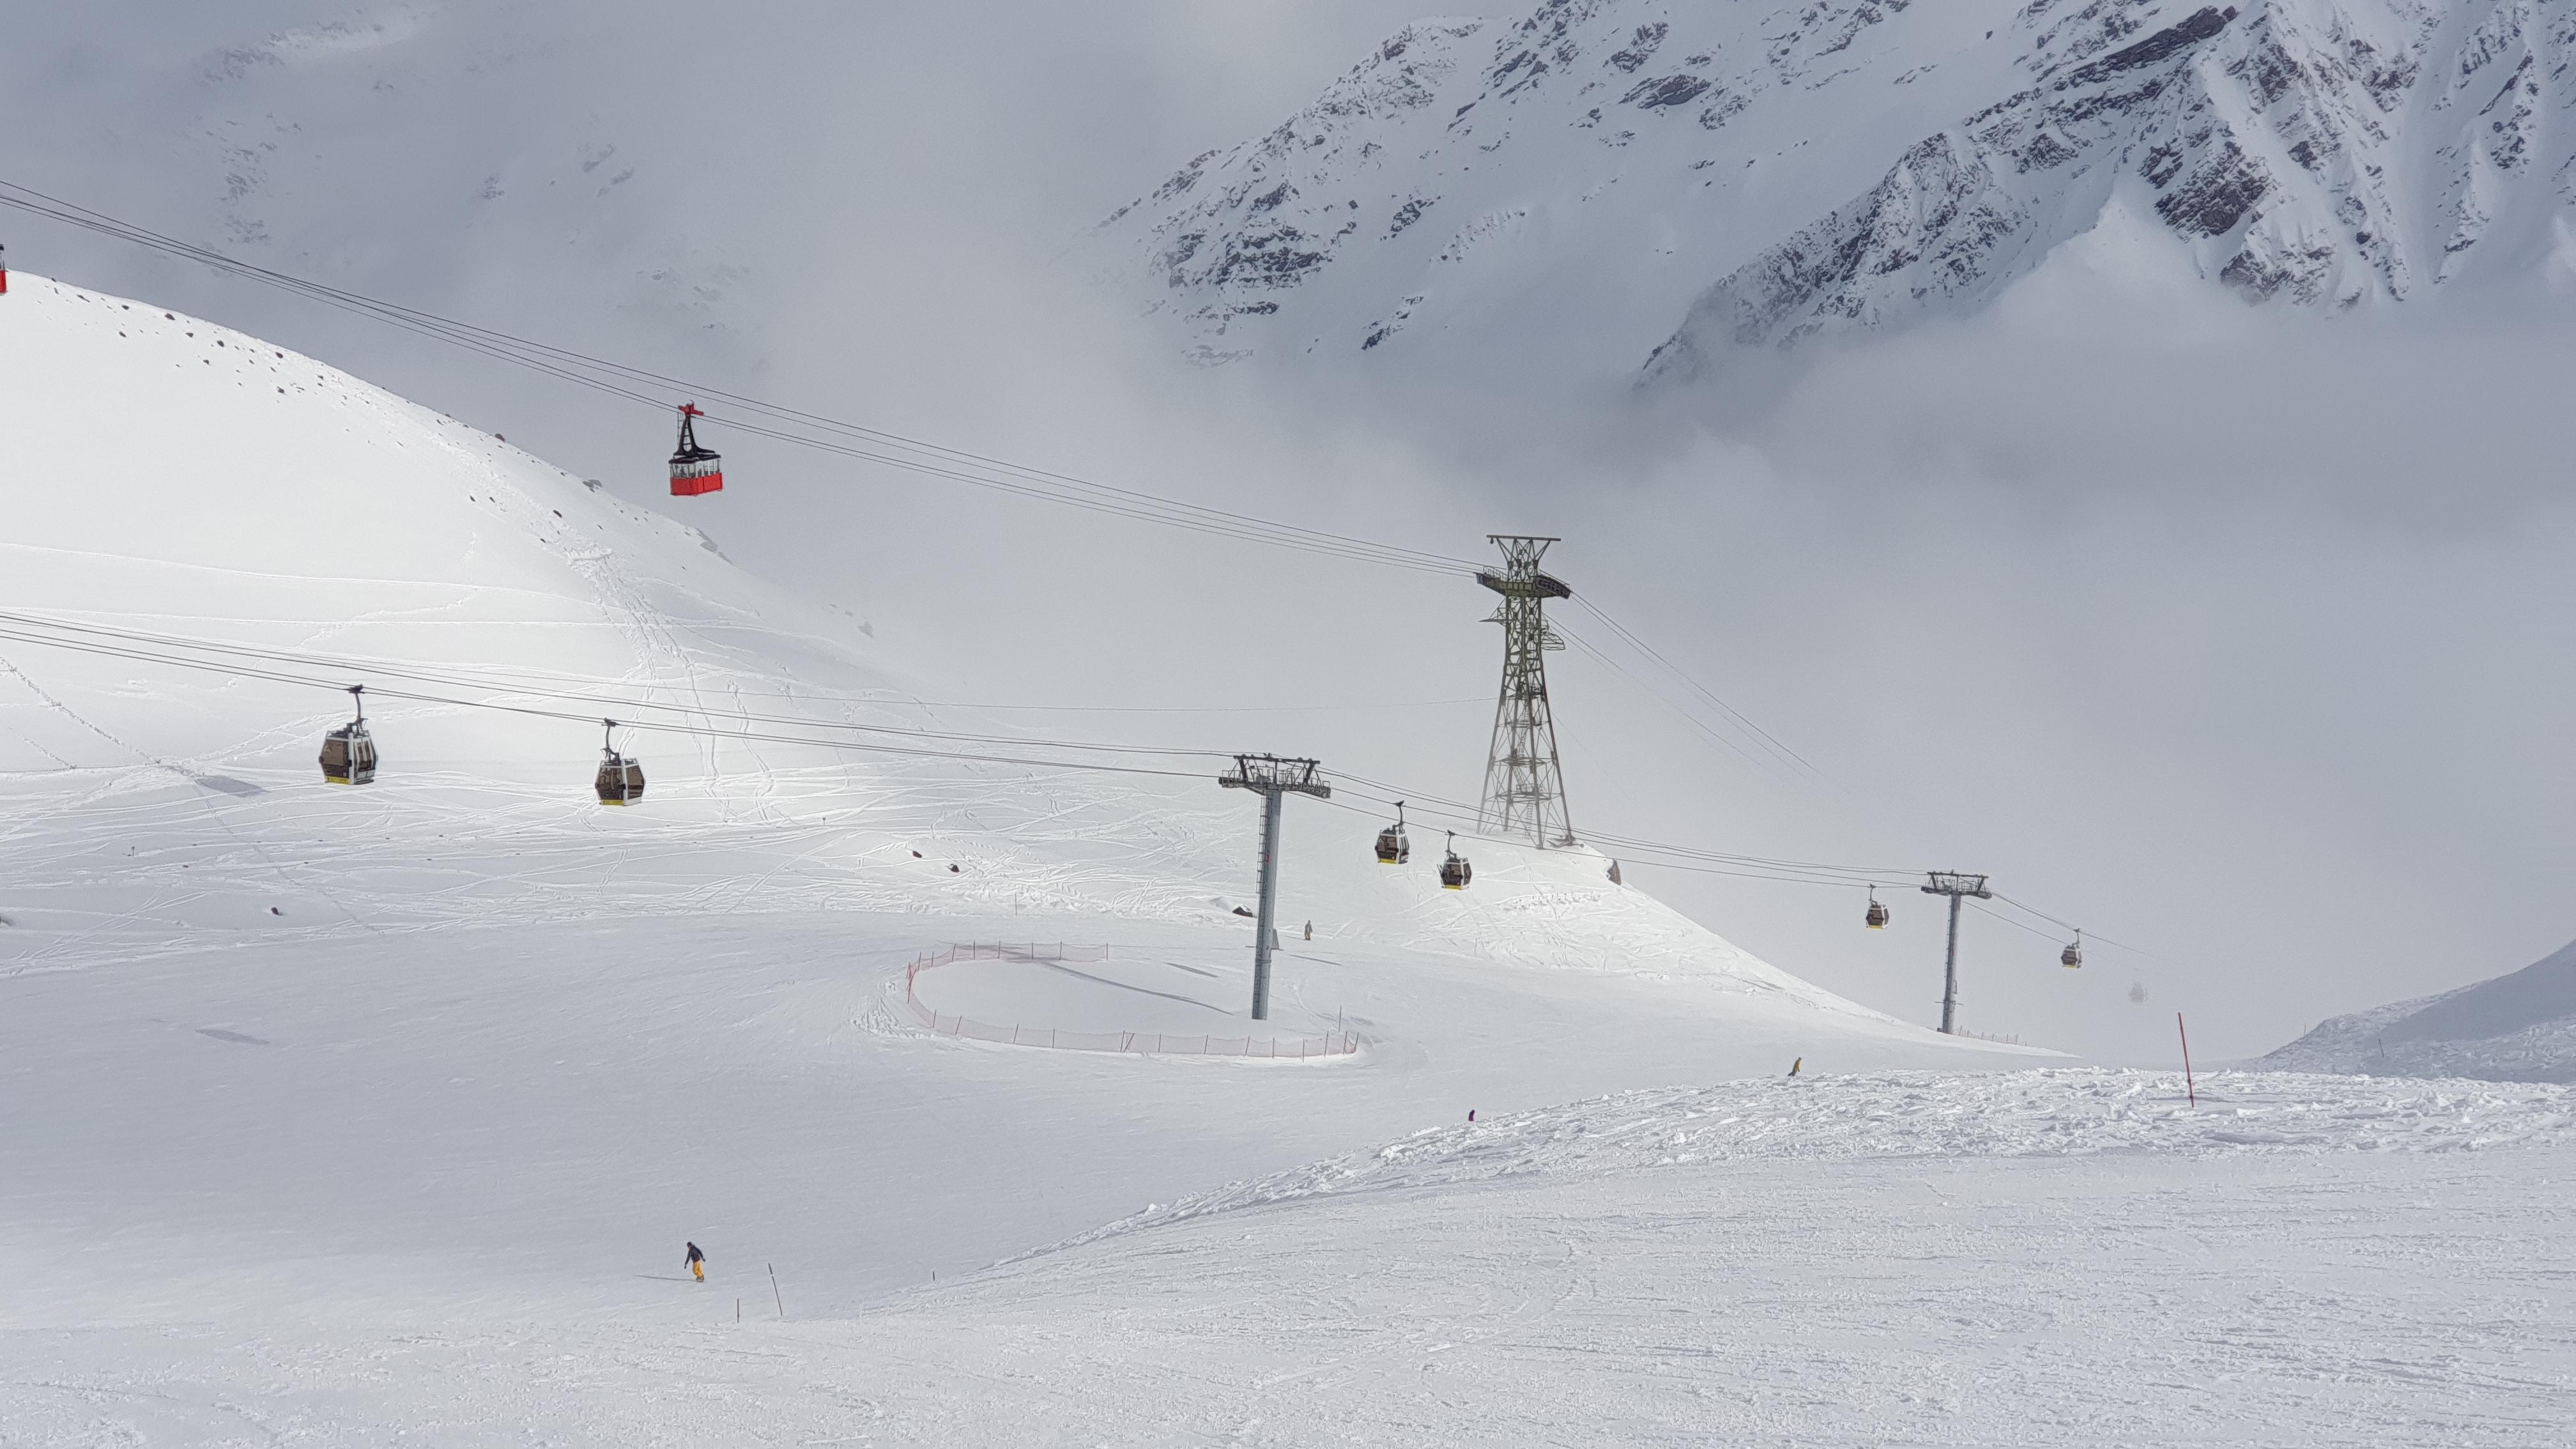 Погода на Эльбрусе в апреле